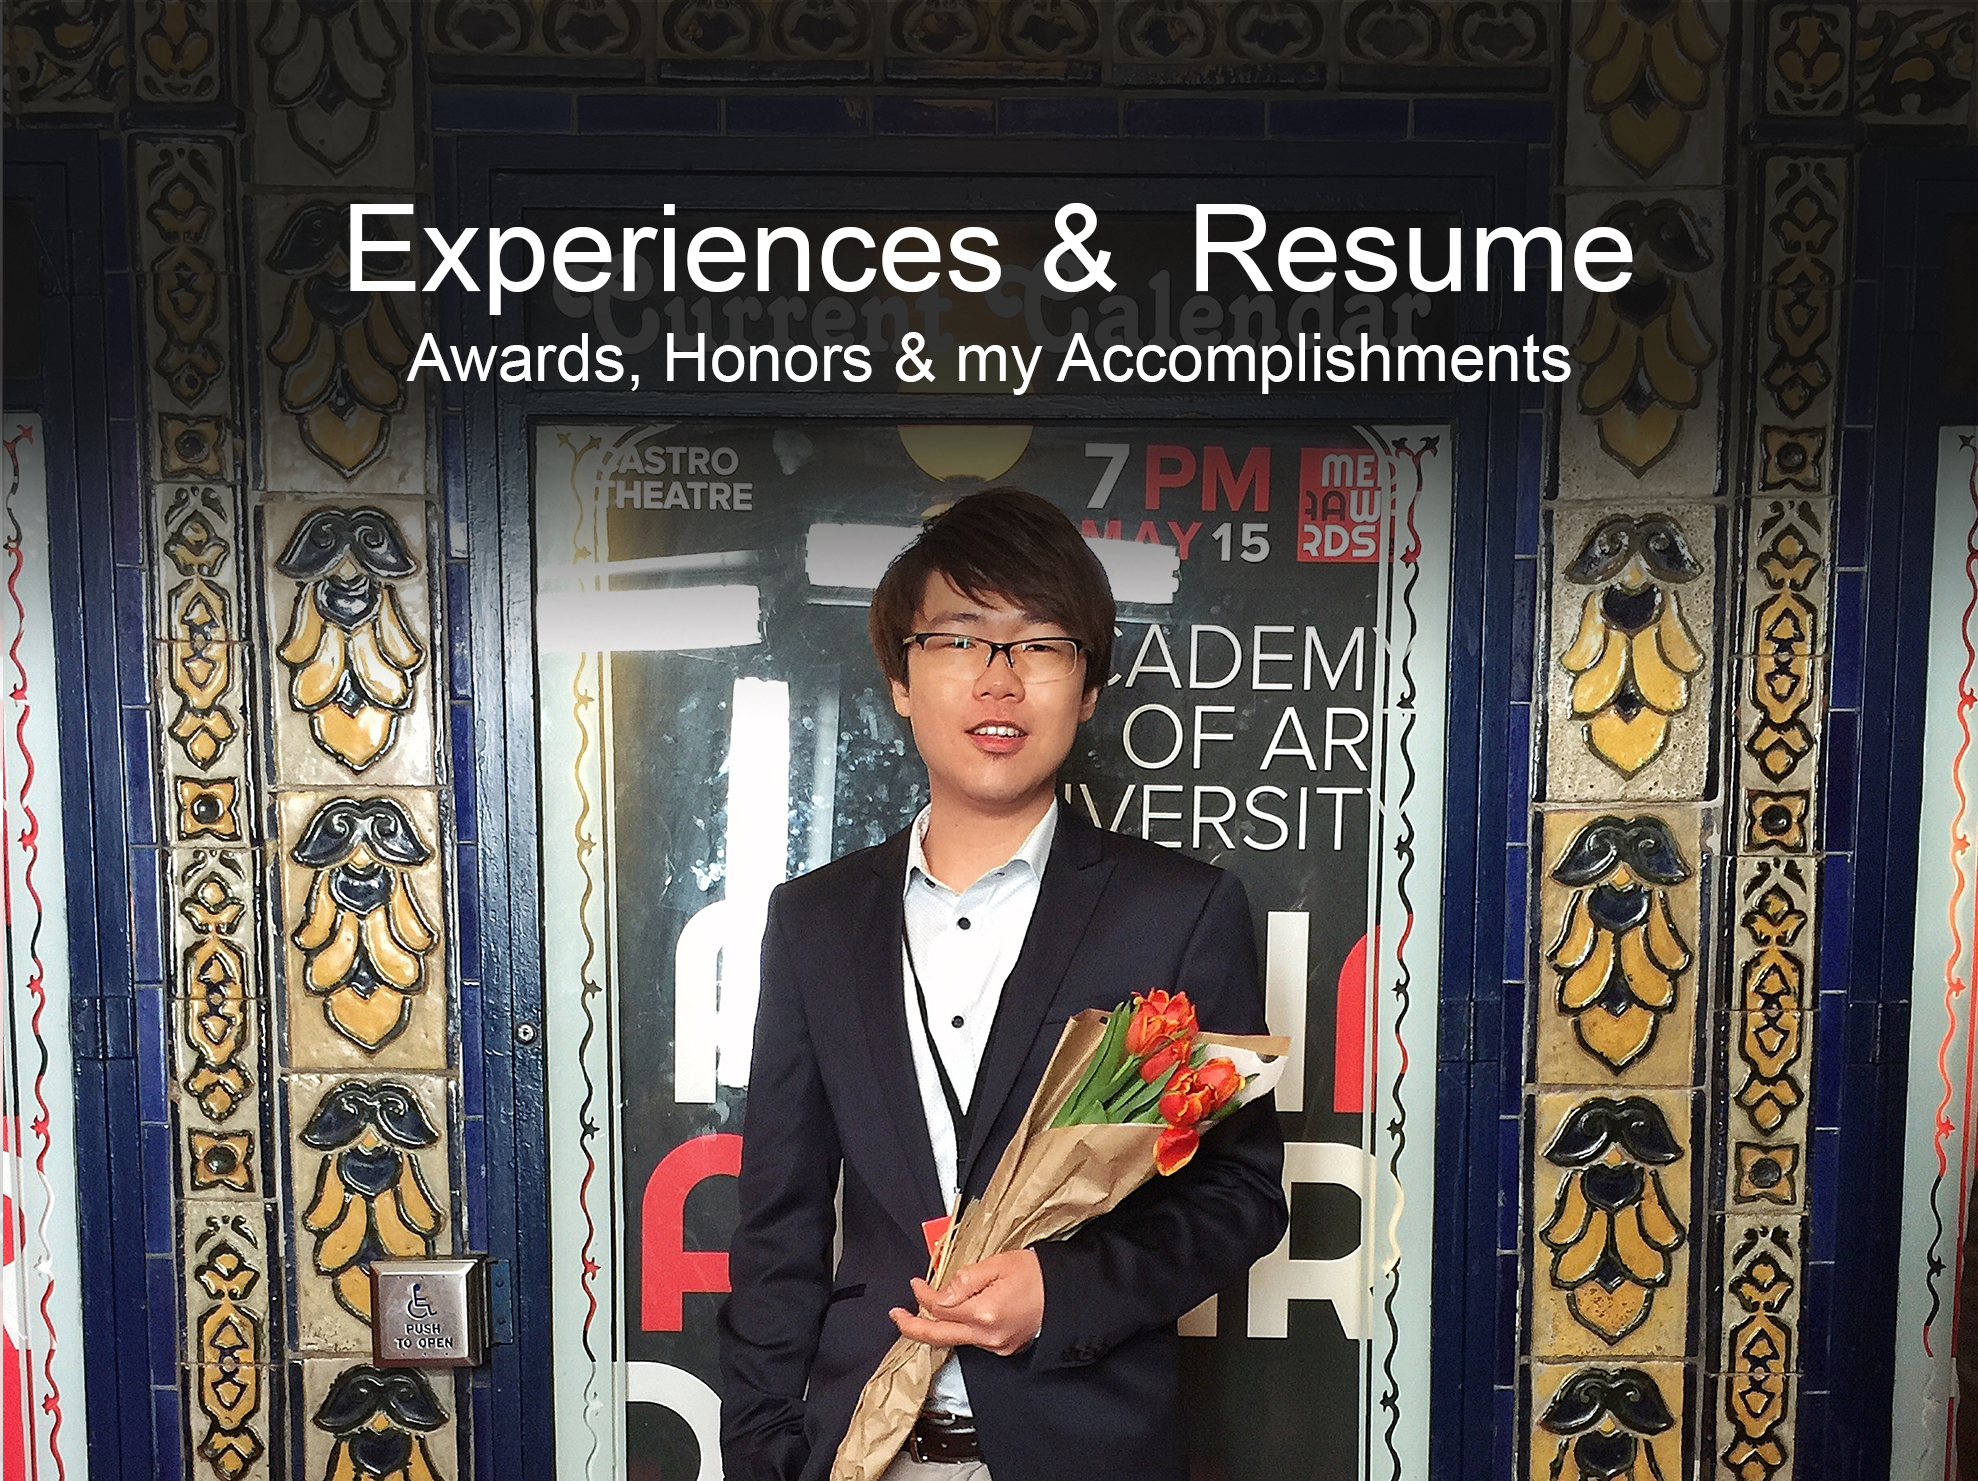 Experiences & Resume